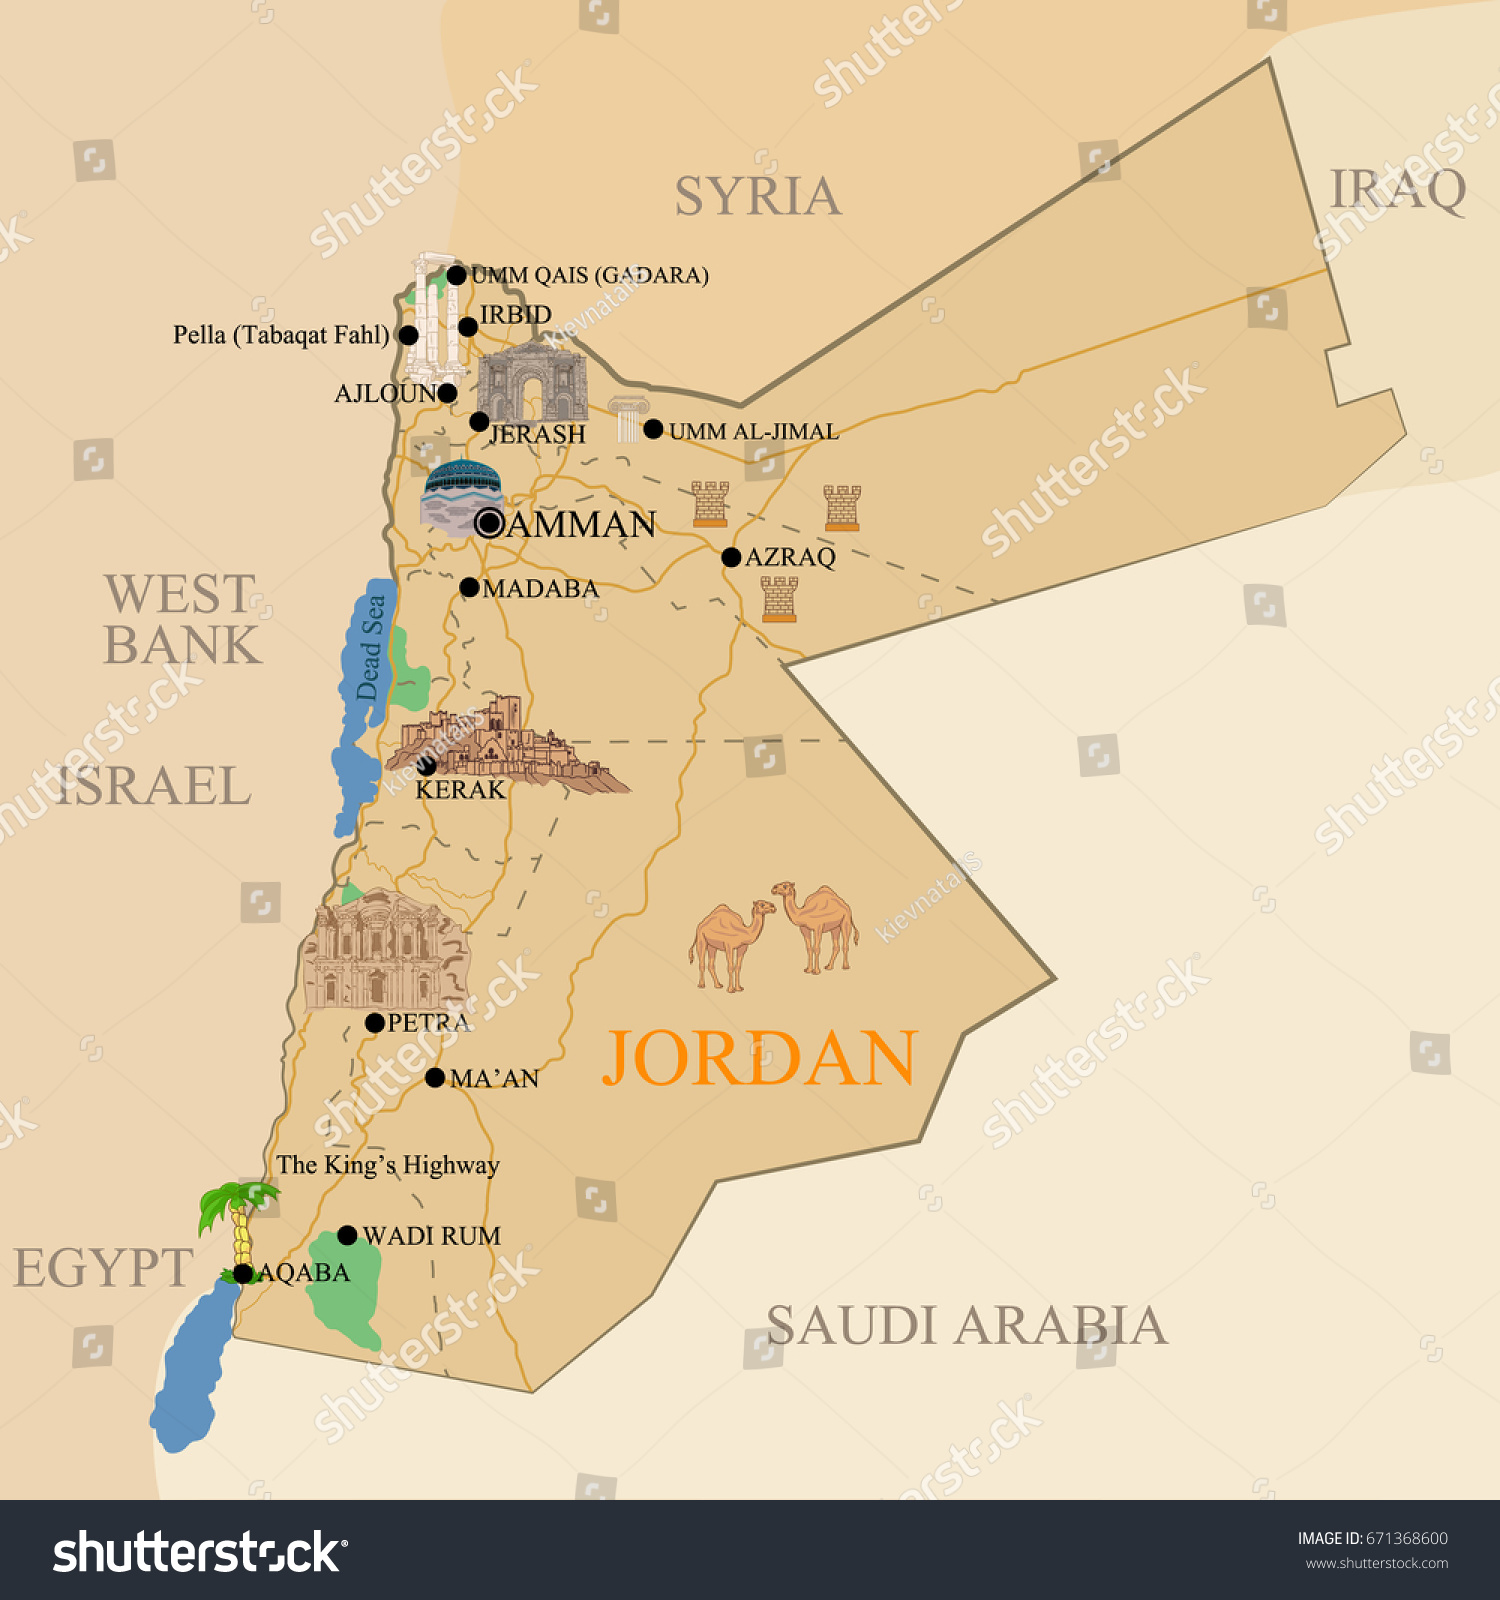 Jordanian tourist map designation historical cultural stock vector jordanian tourist map with a designation of historical cultural reminders publicscrutiny Image collections